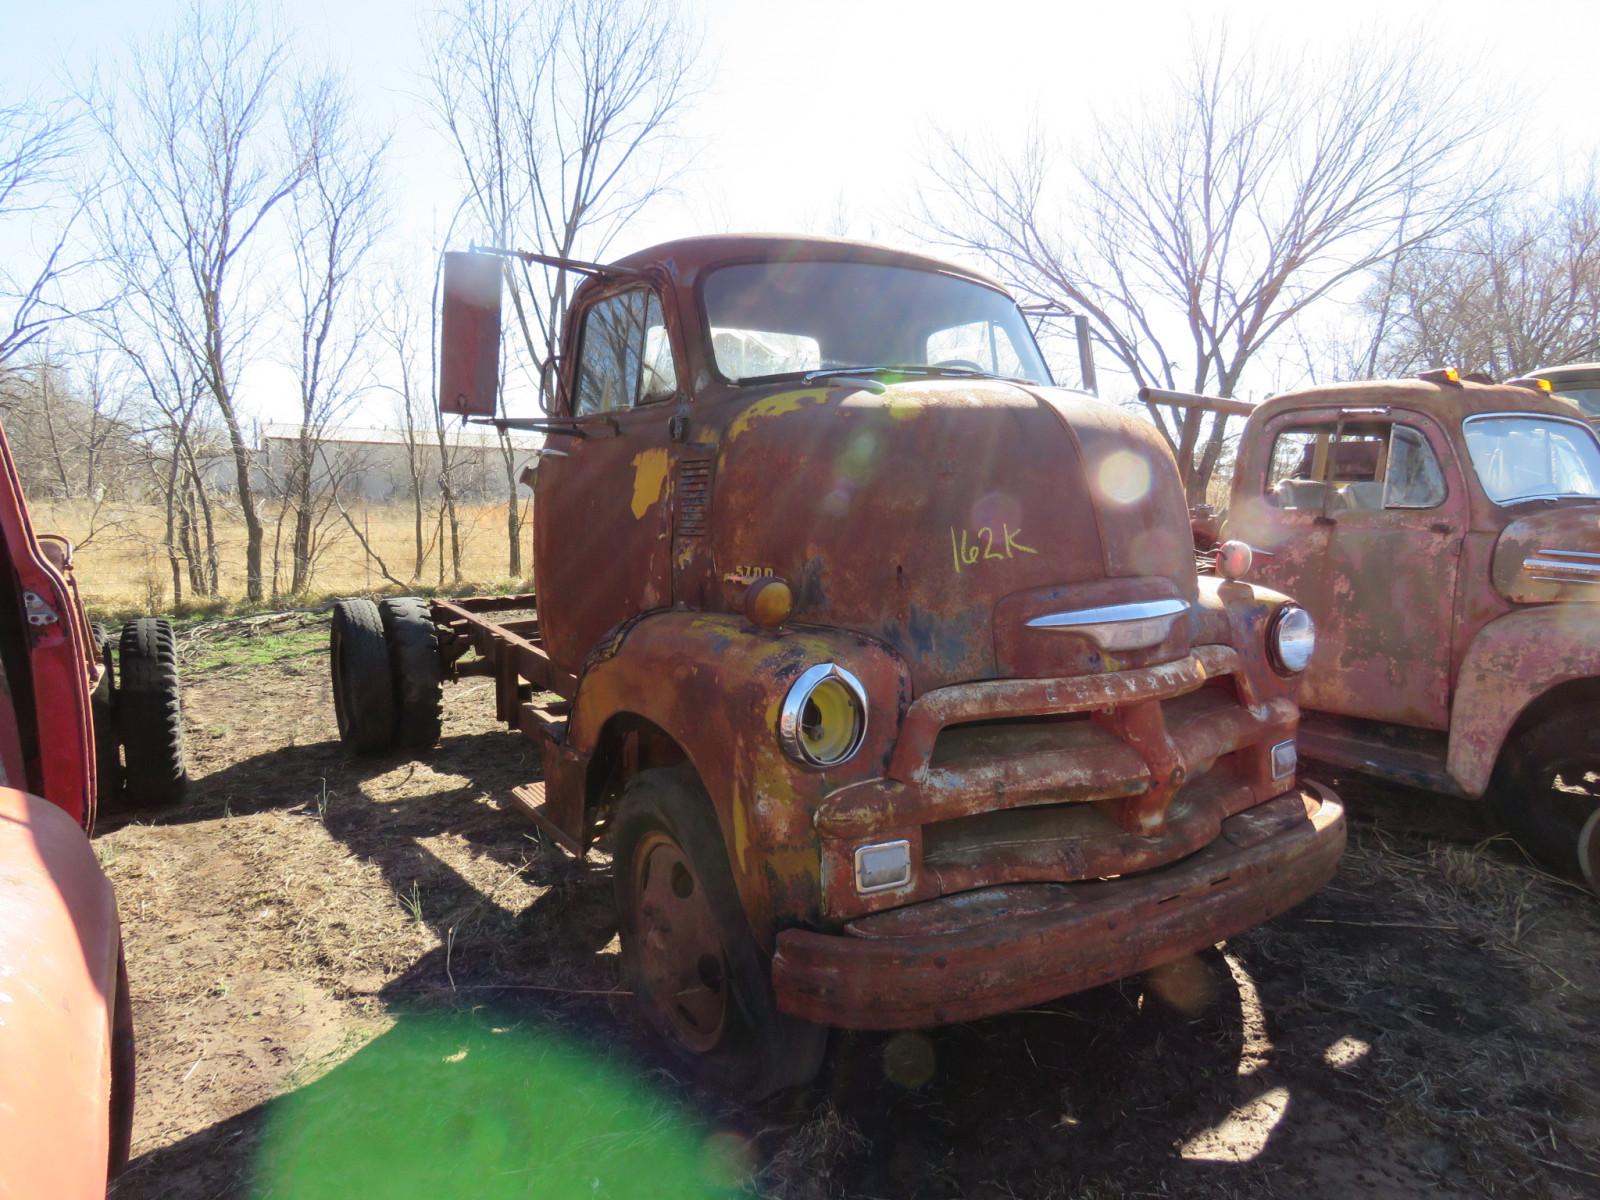 Lot 162k 1954 Chevrolet 5700 Coe Truck Vanderbrink Auctions Ford Image 1